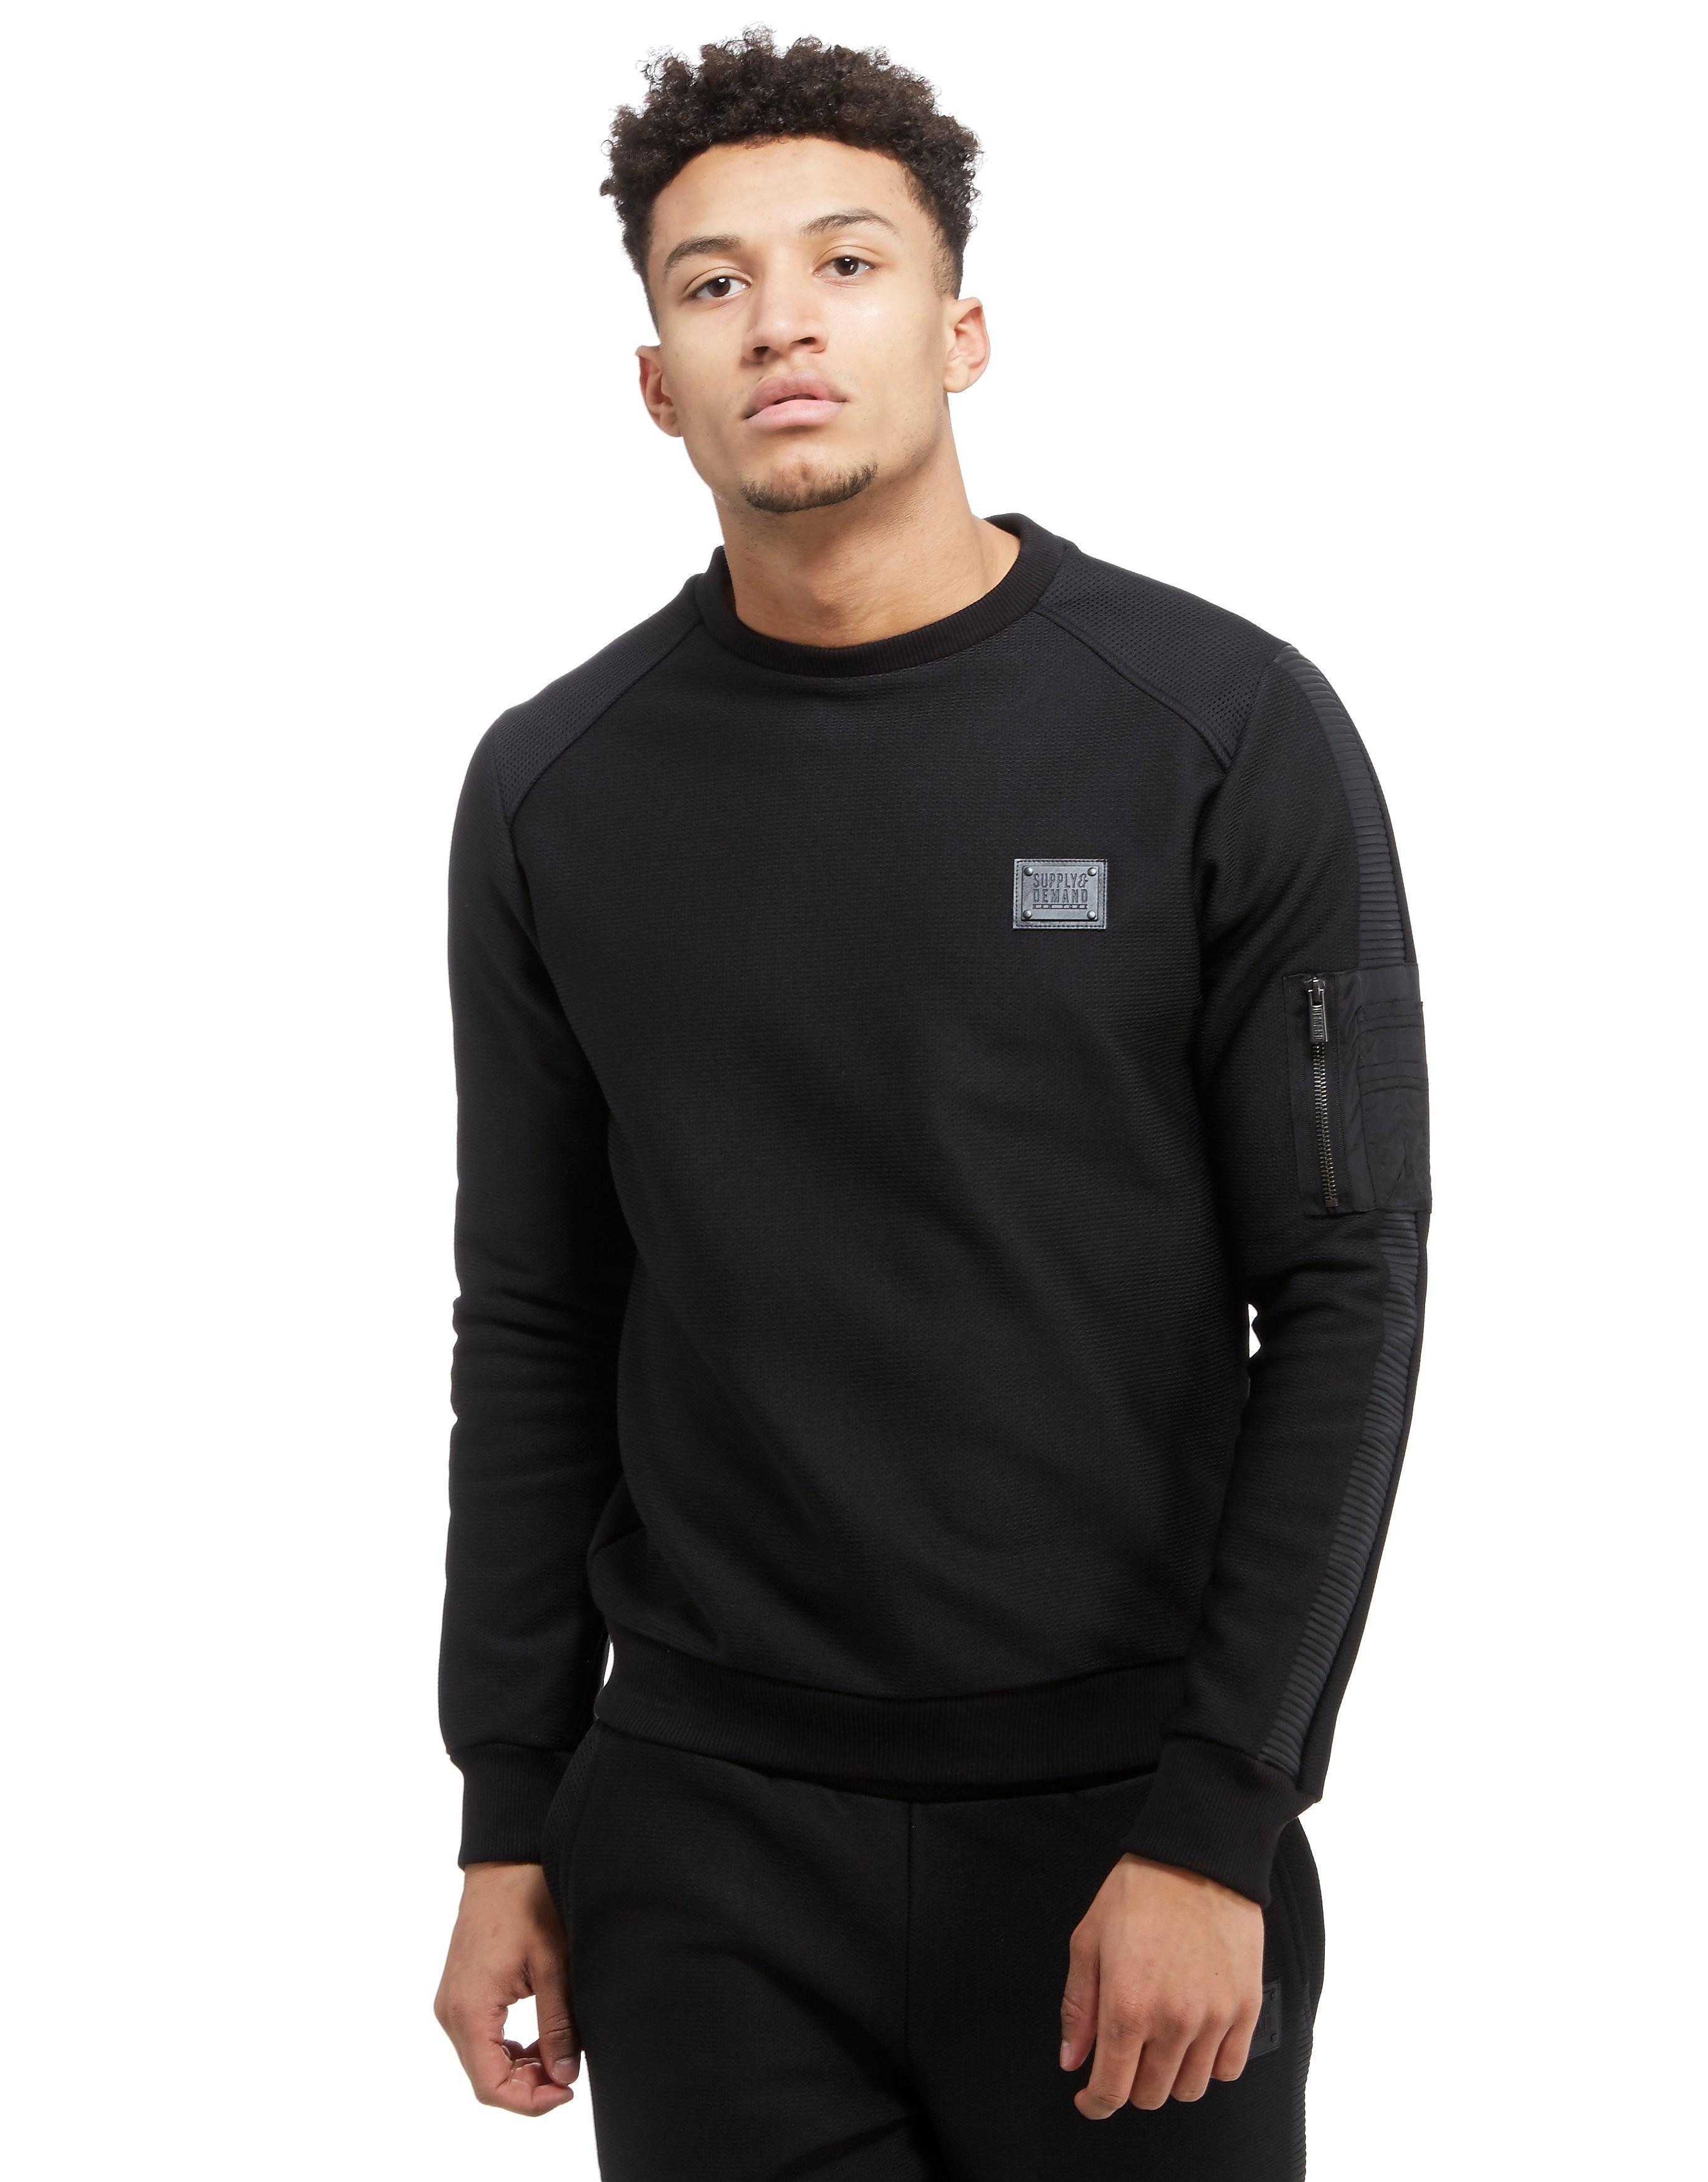 Supply & Demand Ringer Crew Sweatshirt